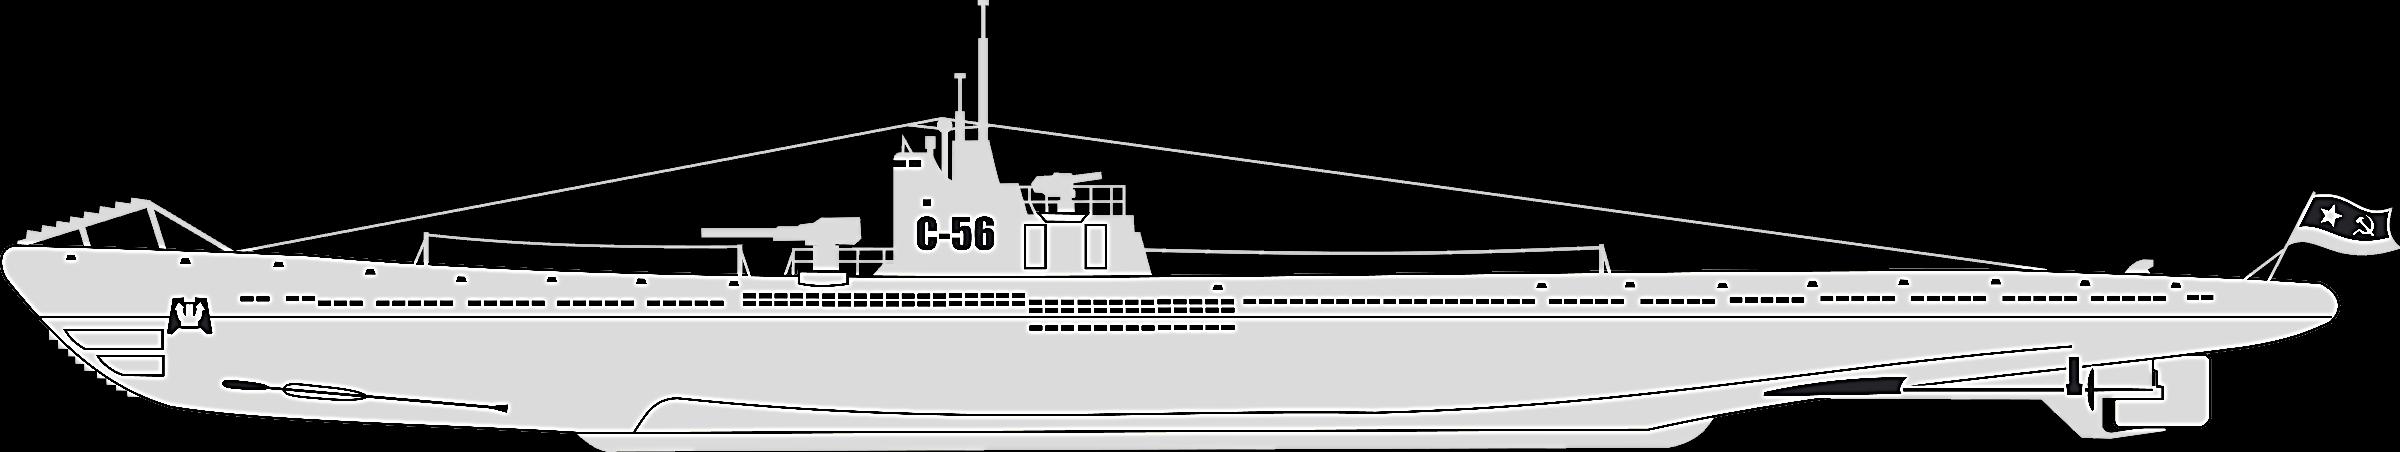 Soviet submarine S-56